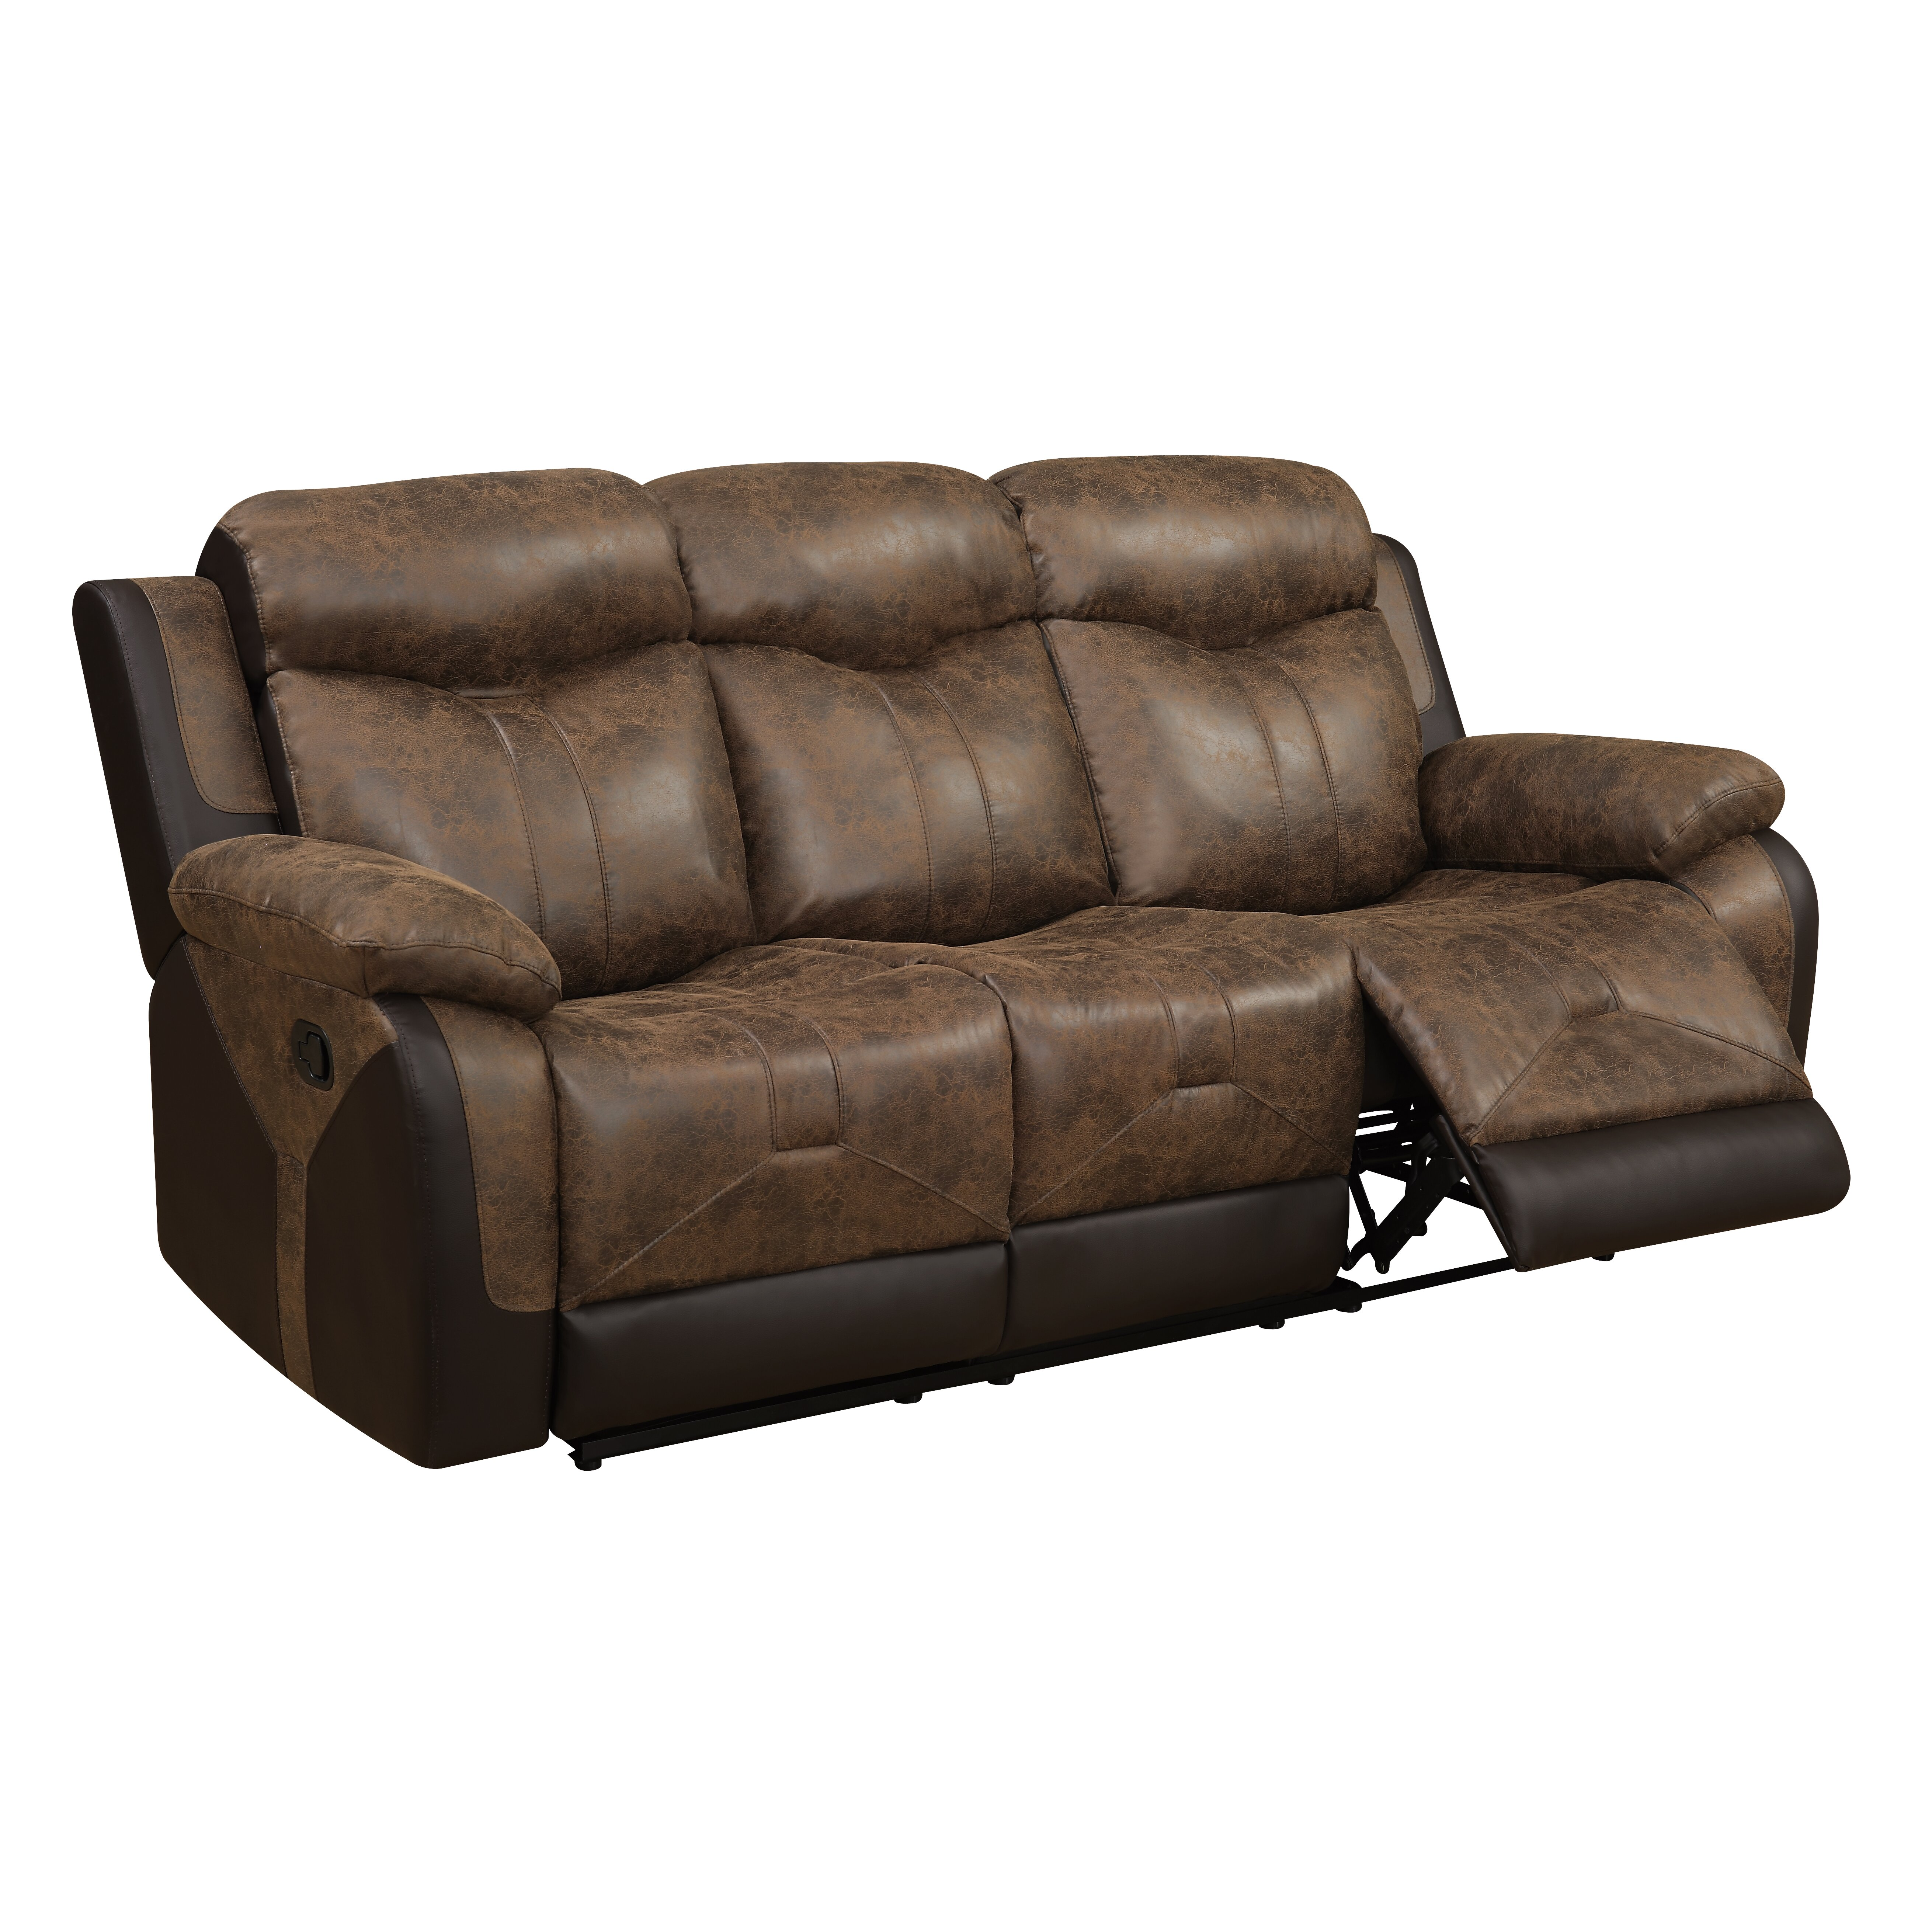 Global furniture usa reclining sofa wayfair for Furniture usa